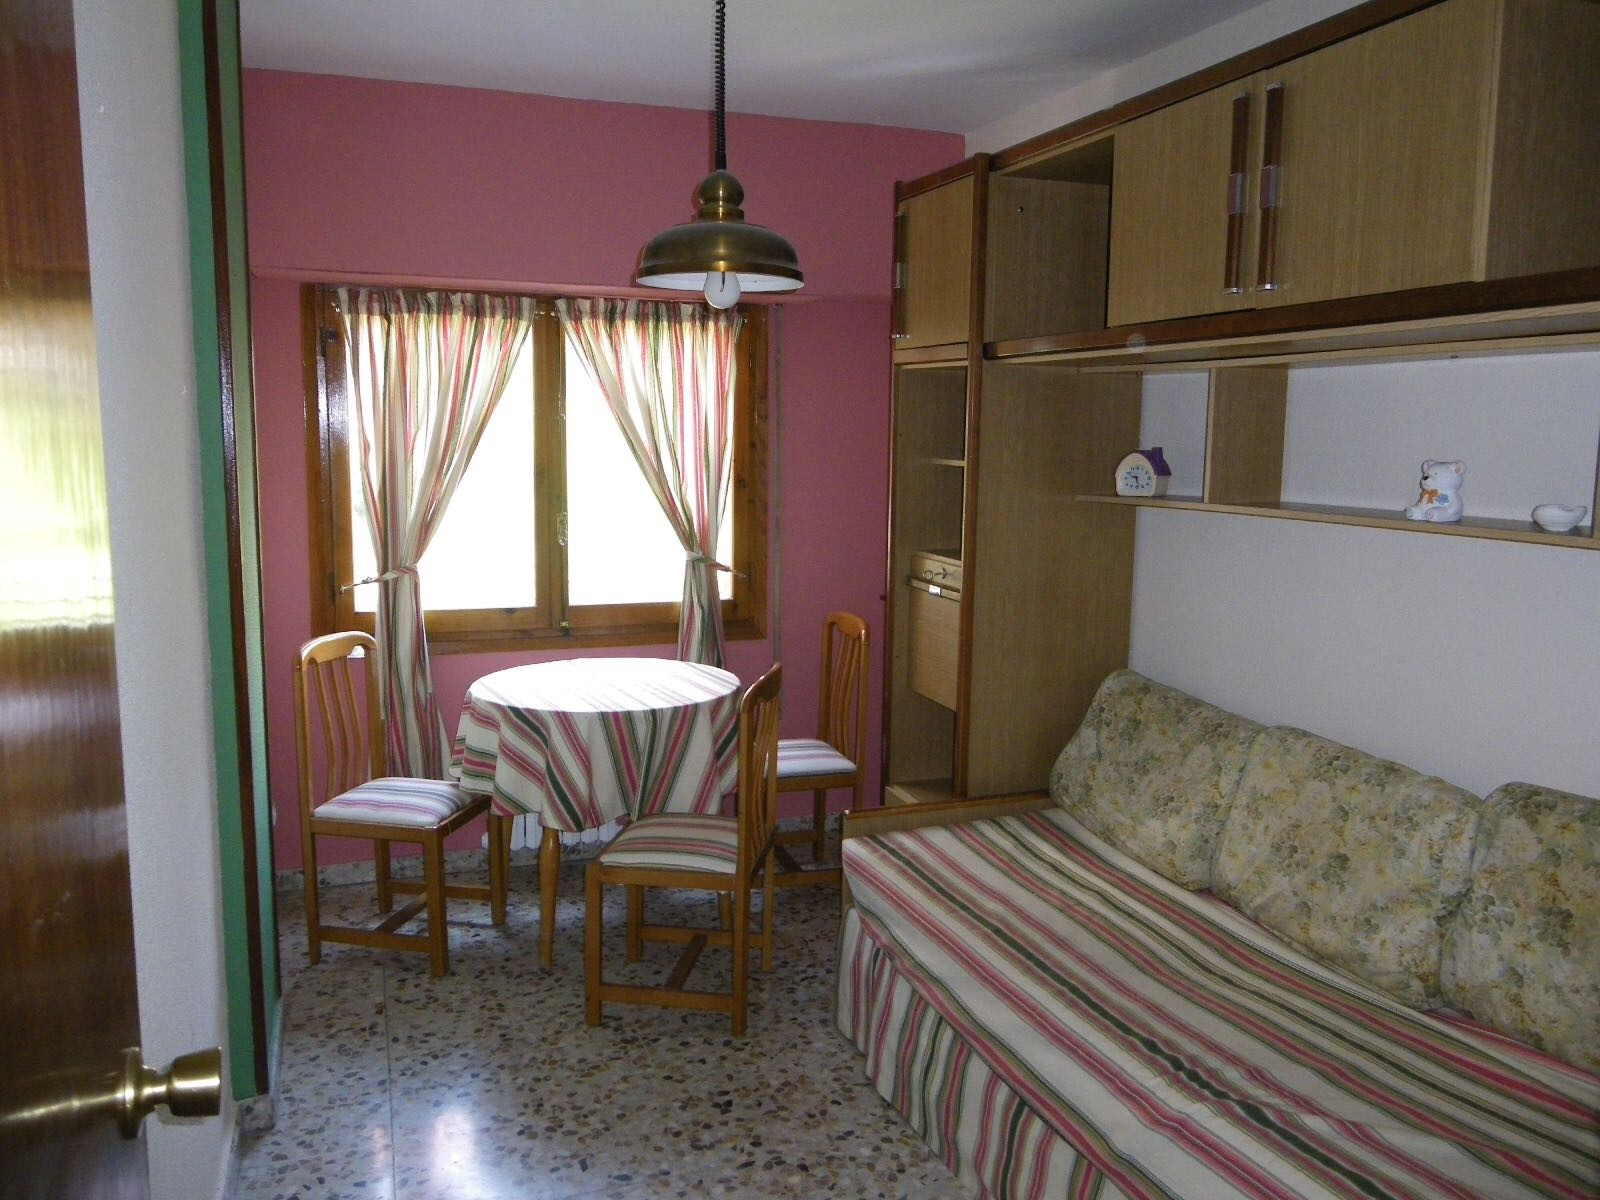 pisos alquiler 3 habitaciones zaragoza